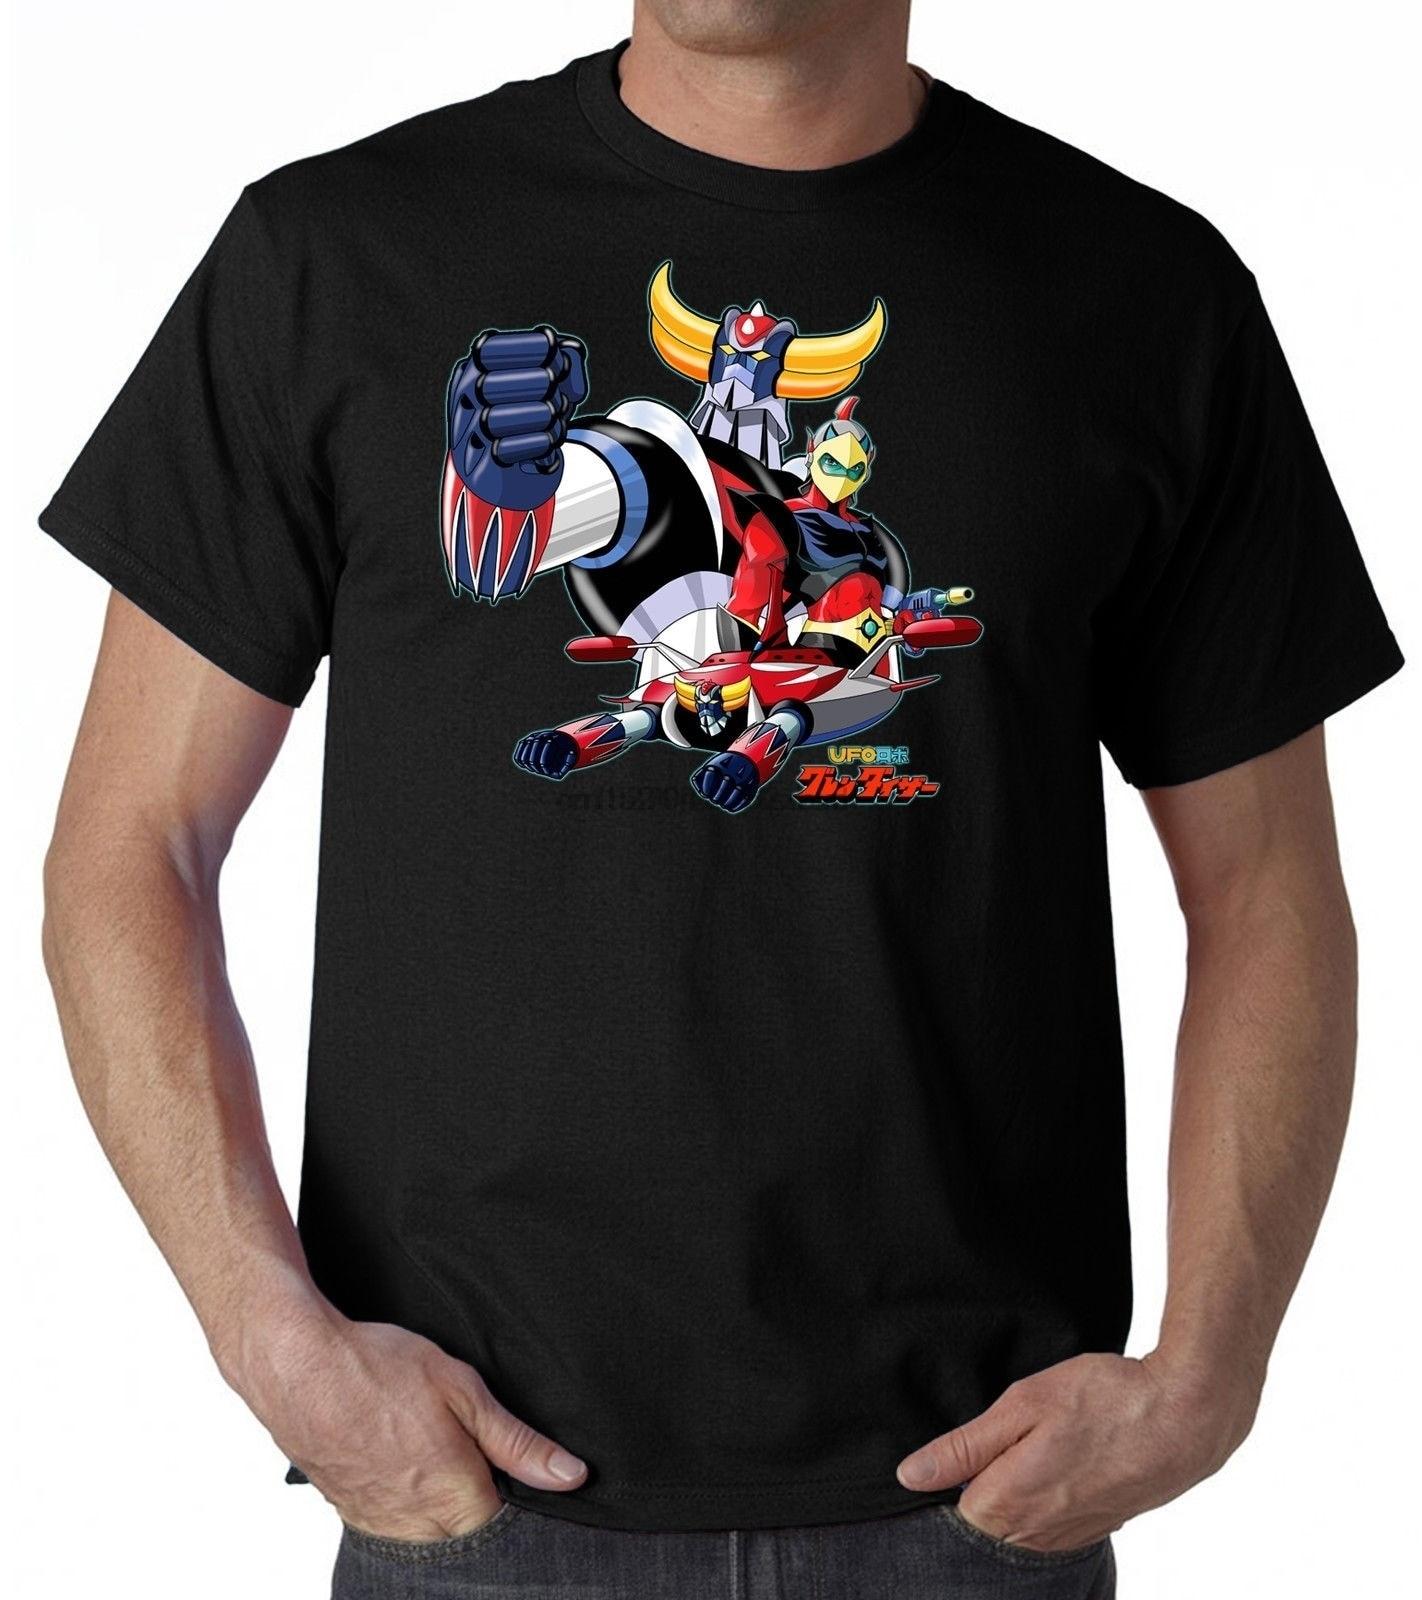 Men Goldrake Ufo Robot T Shirt Uomo Bimbo Cartoon Anni 80 Anime Printed T-Shirt 2019 Fashion Brand Top Tee Plus Size